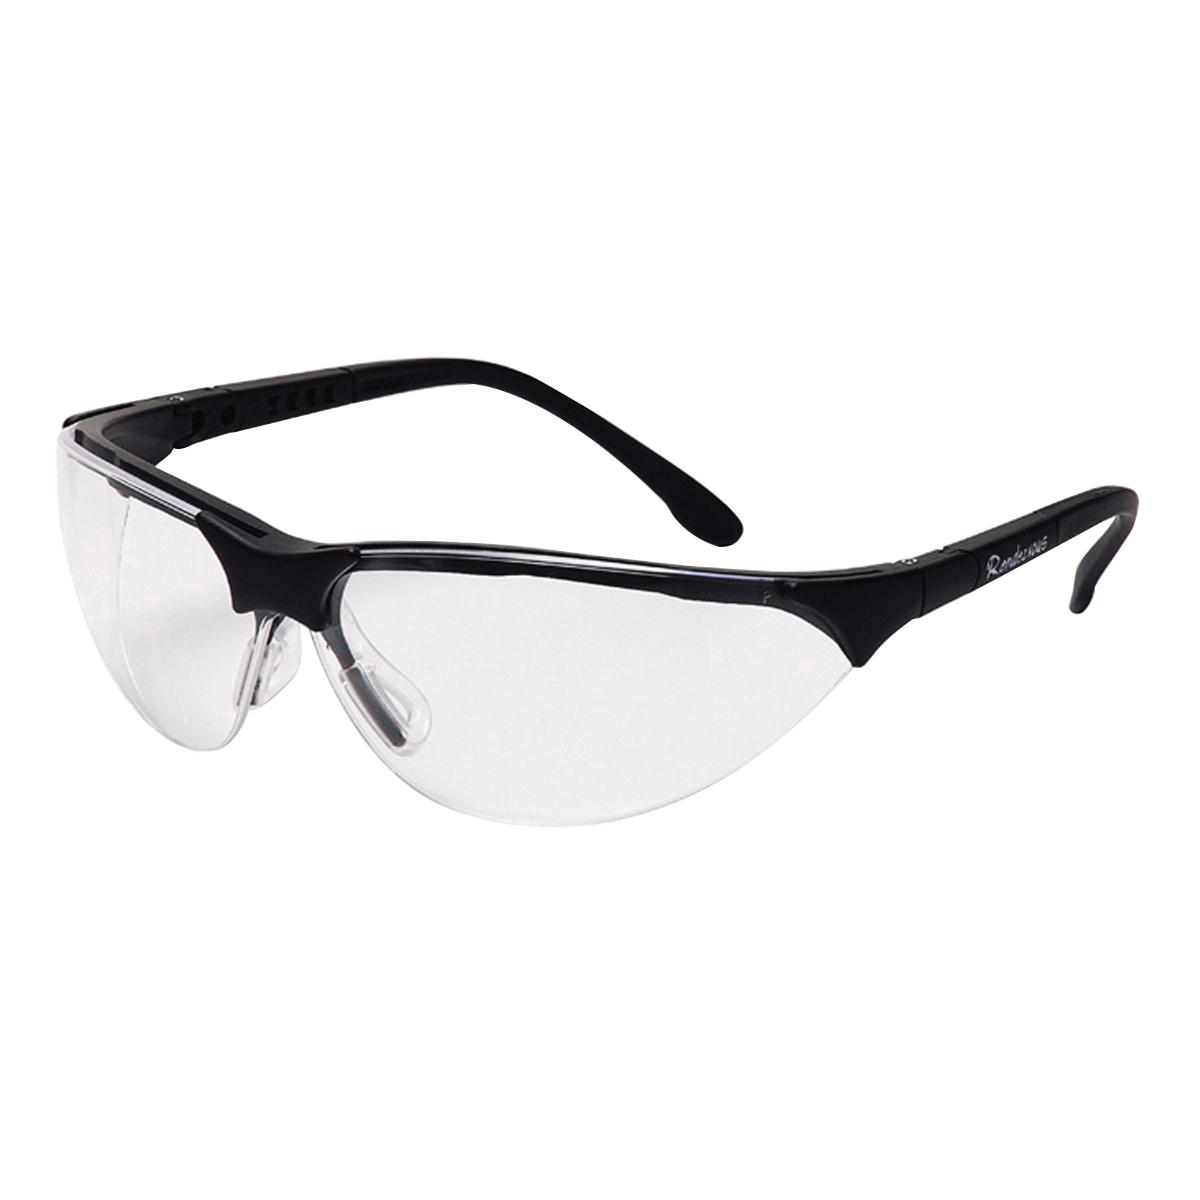 Pyramex® Rendezvous® Safety Glasses, Black Frame, Clear H2X Anti-Fog Lens